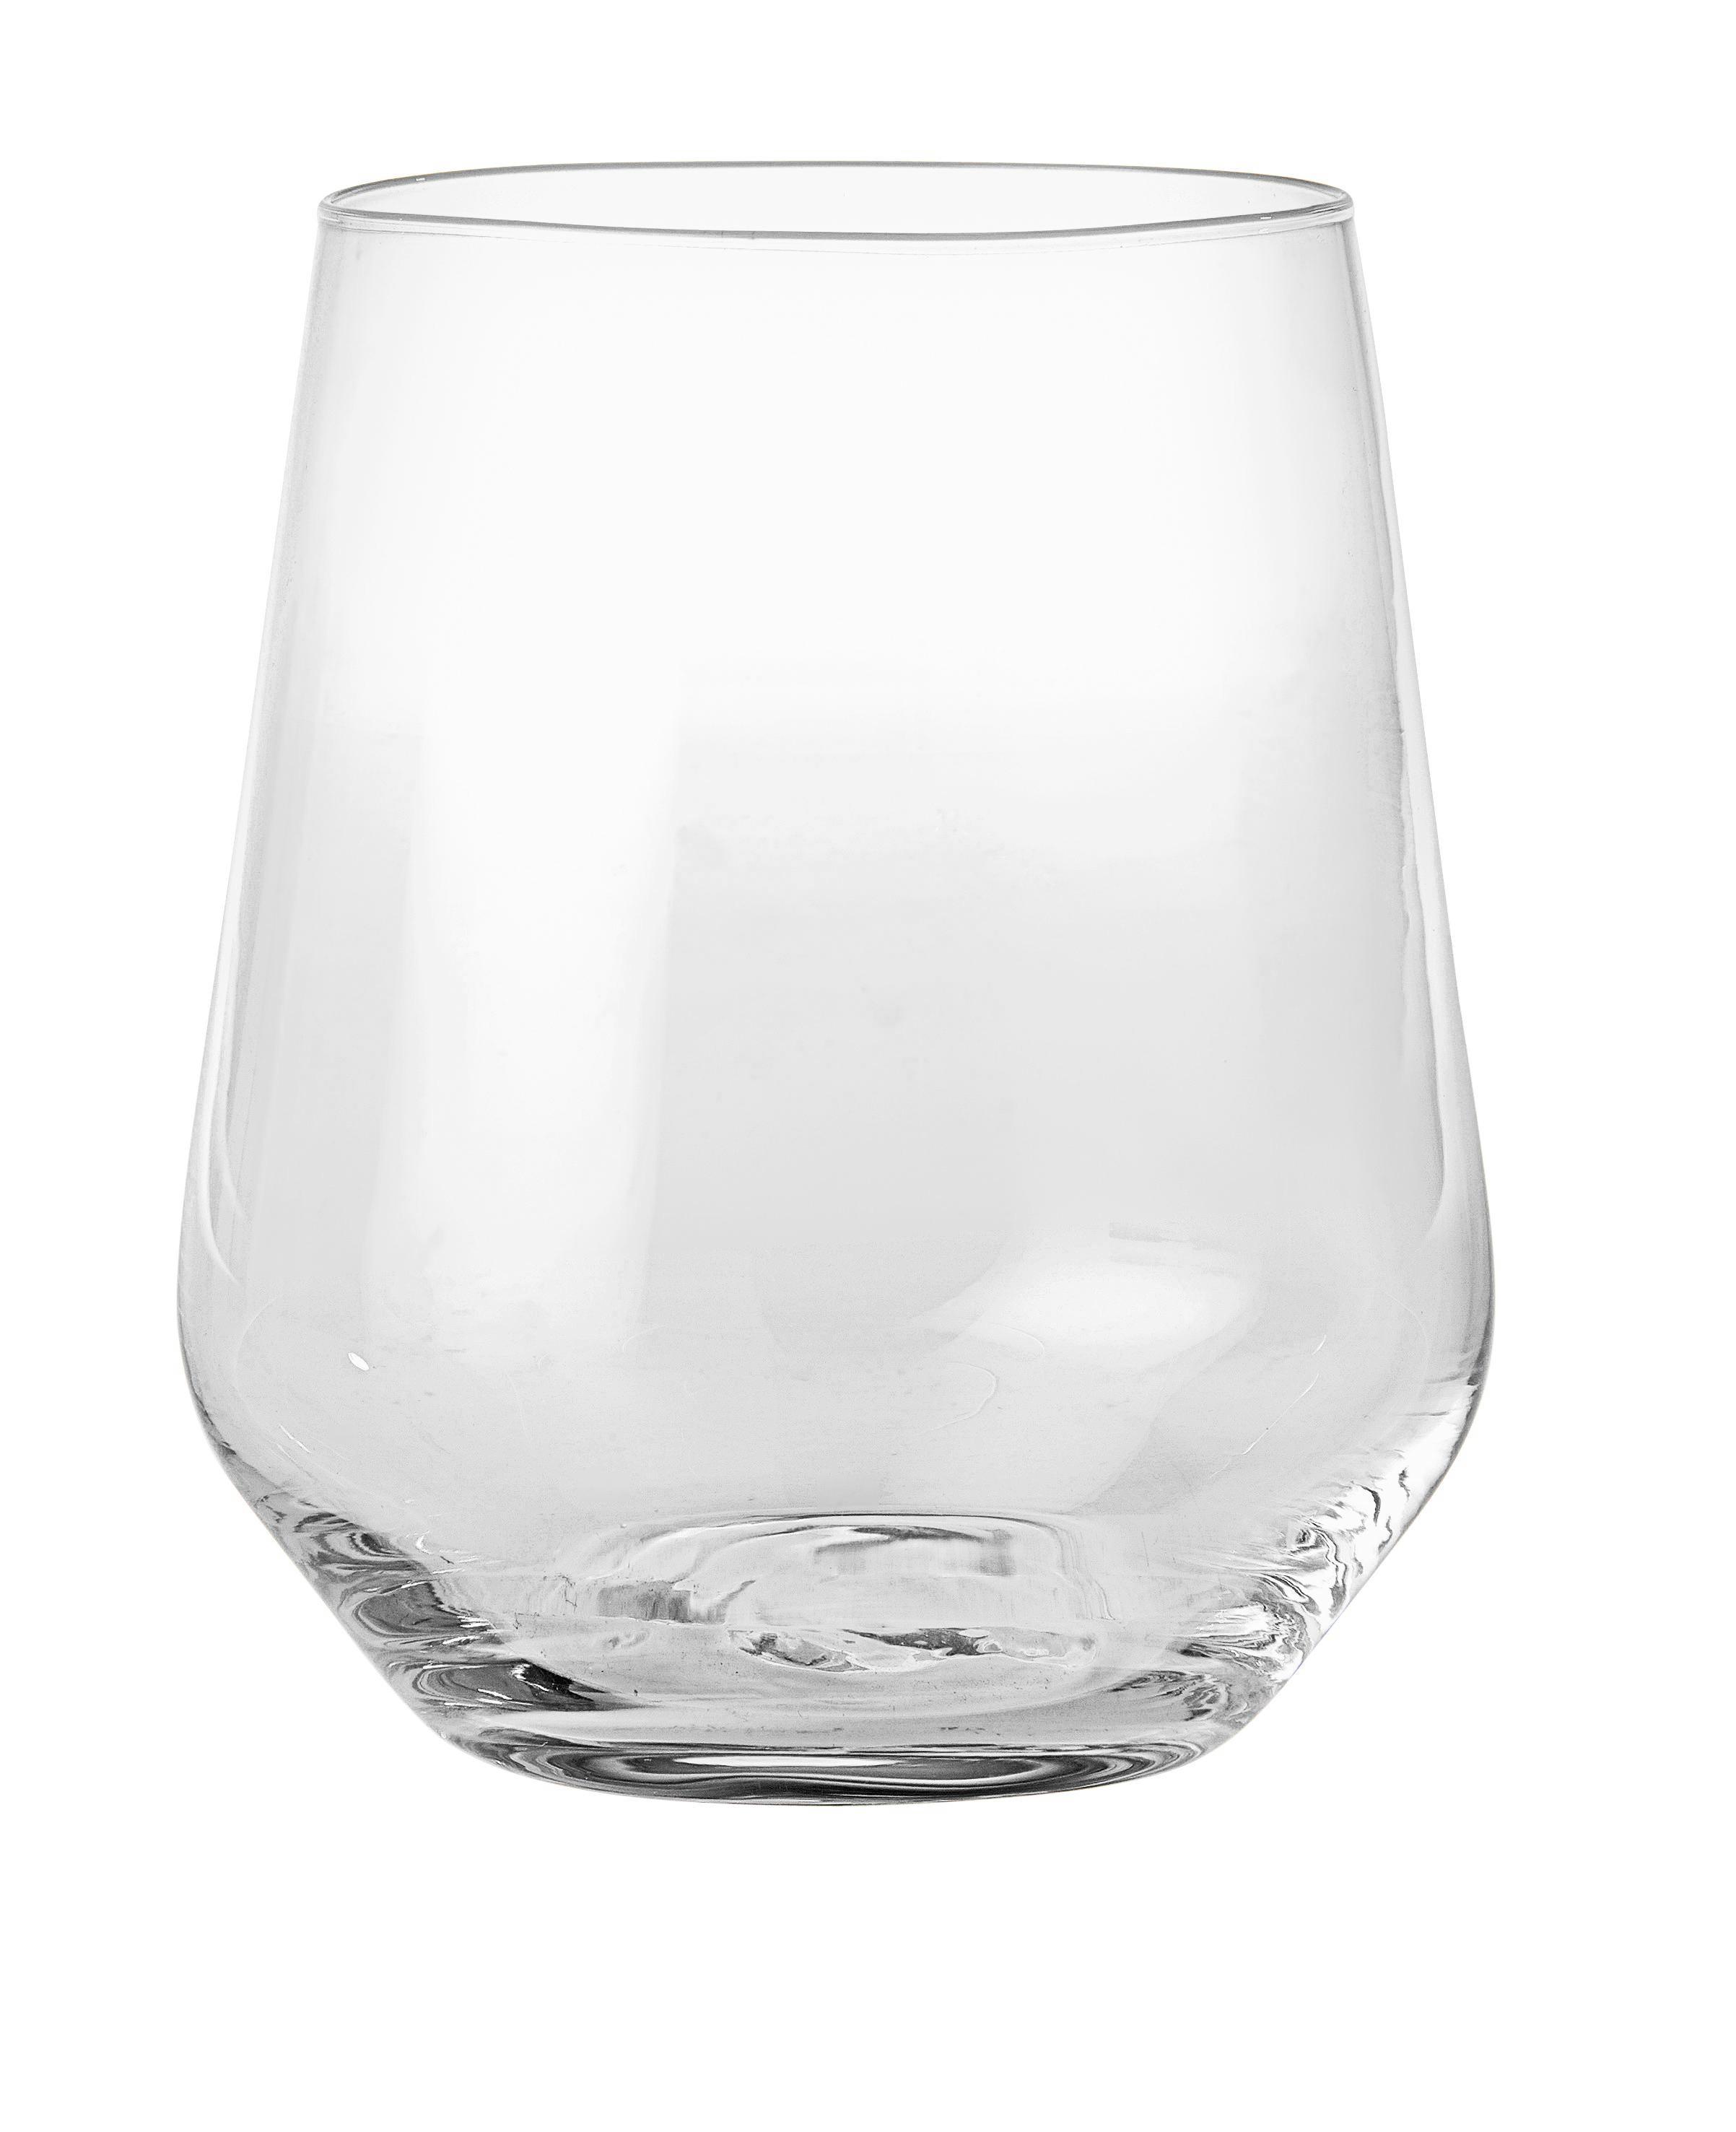 Trinkglas Siena aus Glas, ca. 400ml - Klar, MODERN, Glas (0,4l) - MÖMAX modern living